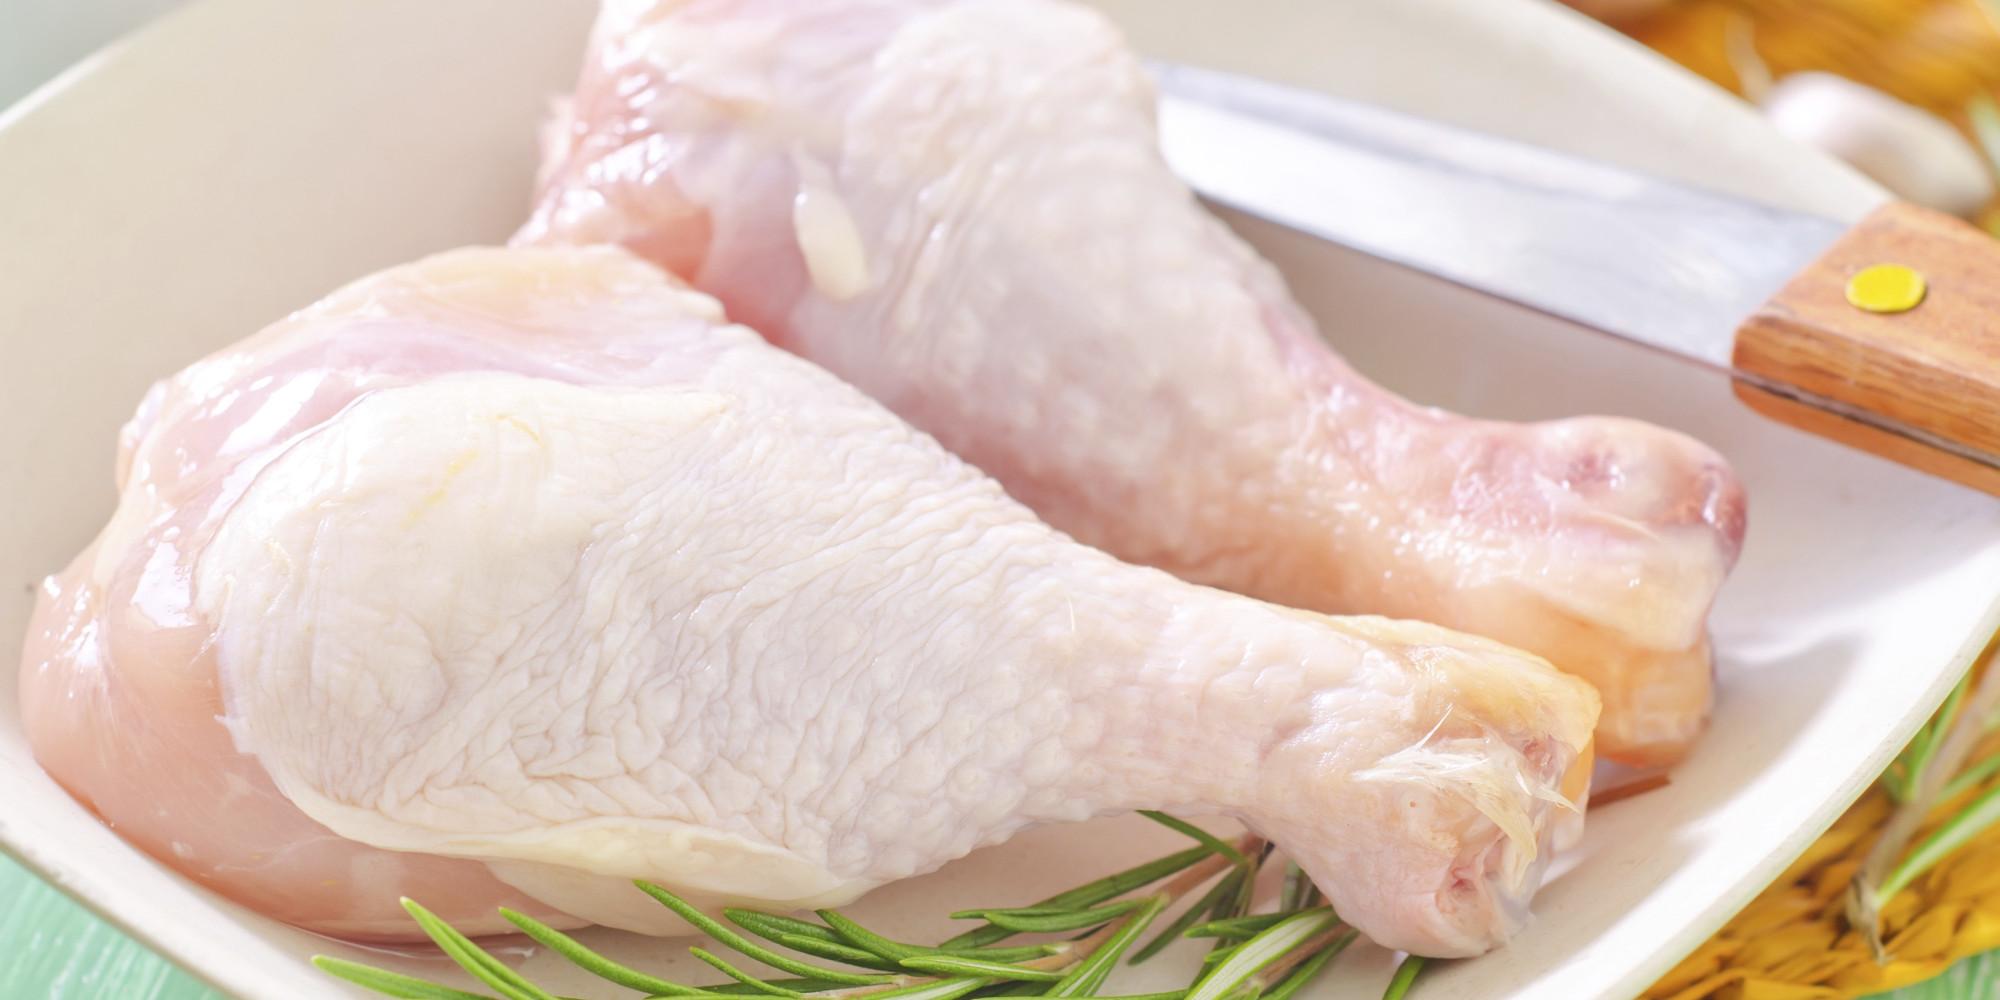 Raw chicken leg